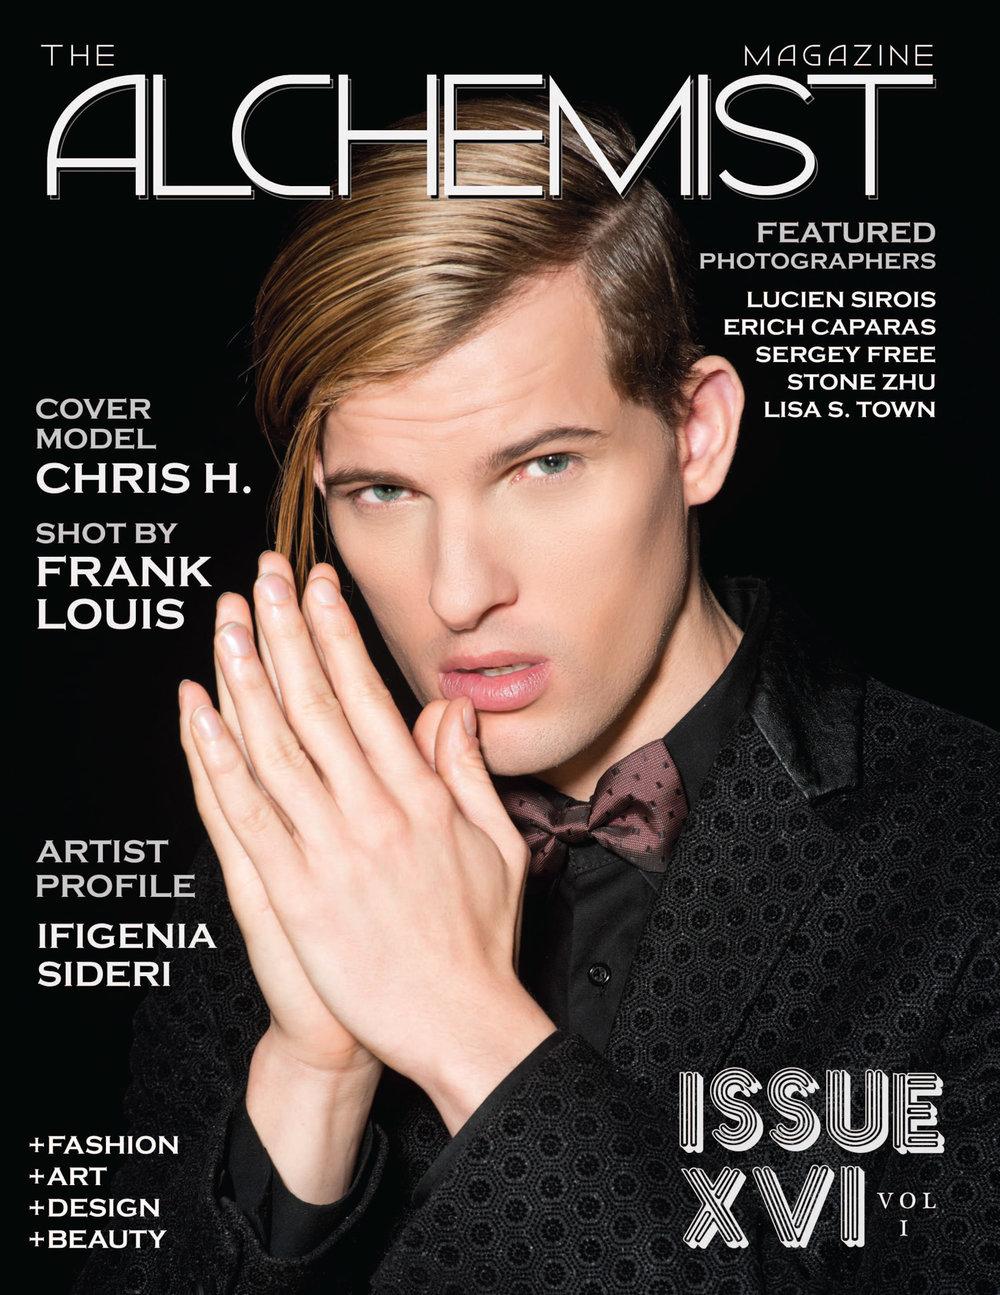 Frank Louis - Chris H - Issue XVI Vol I Tearsheets-1.jpg